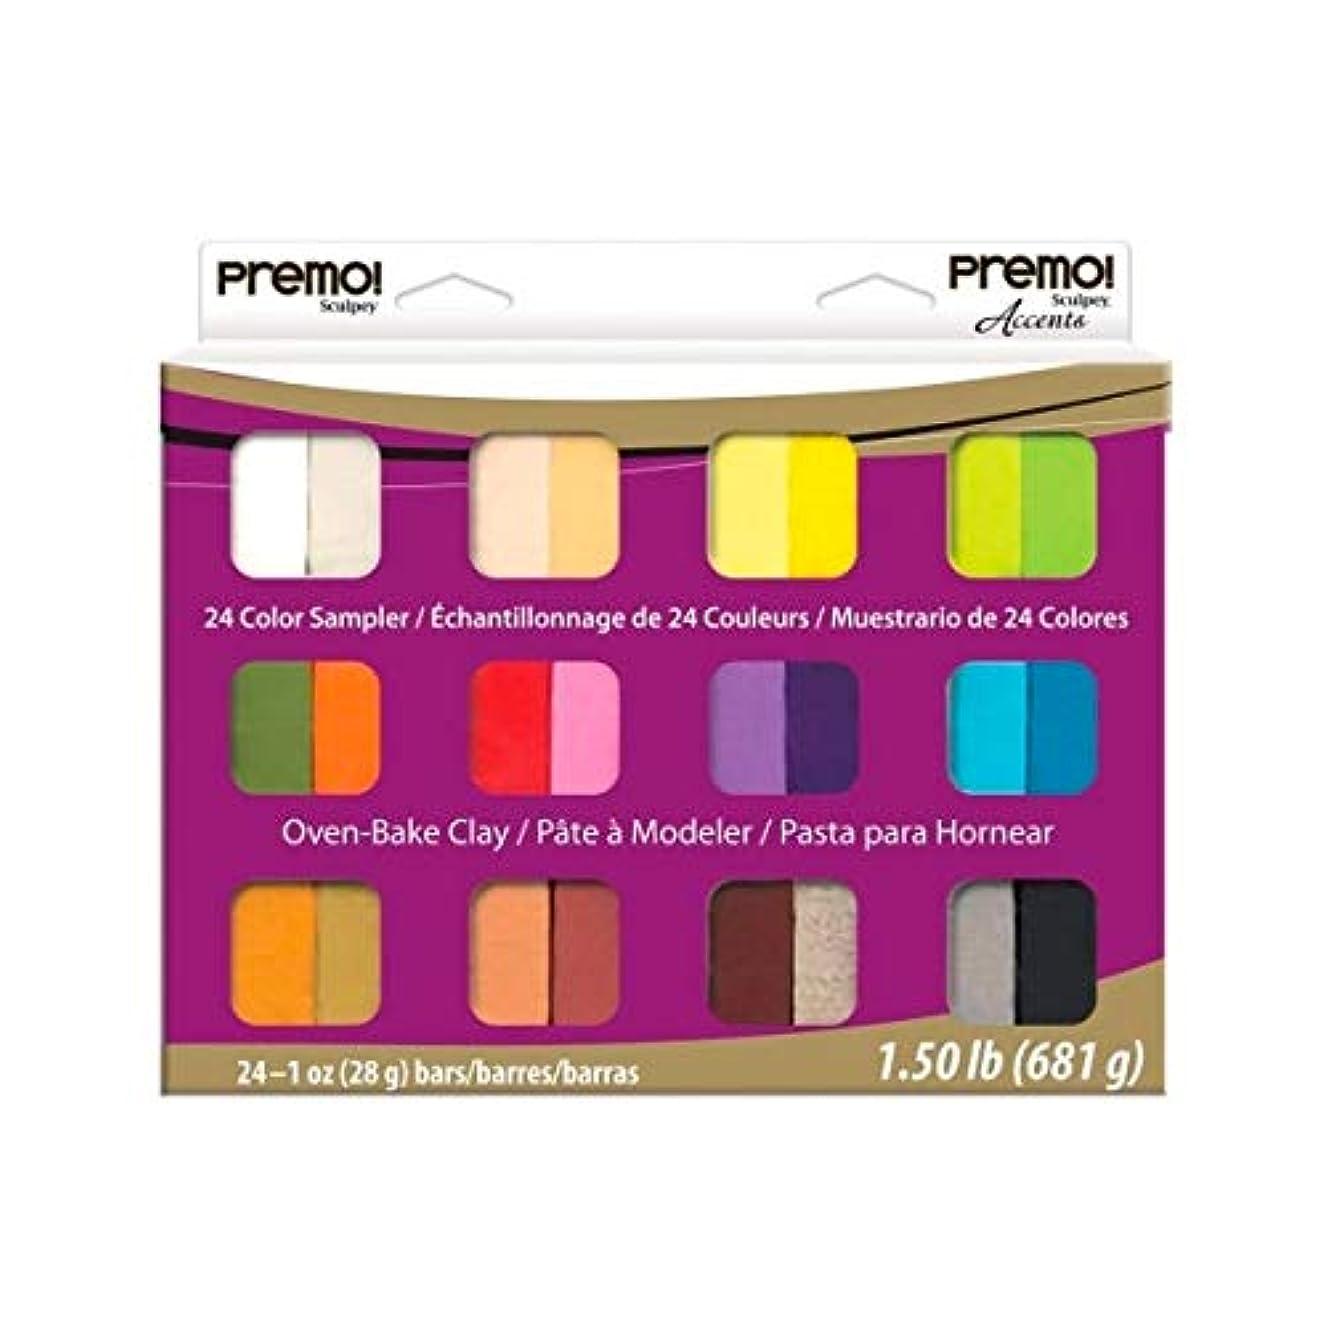 Premo SculpeyAccents 24 Colors Sampler, Set of 24